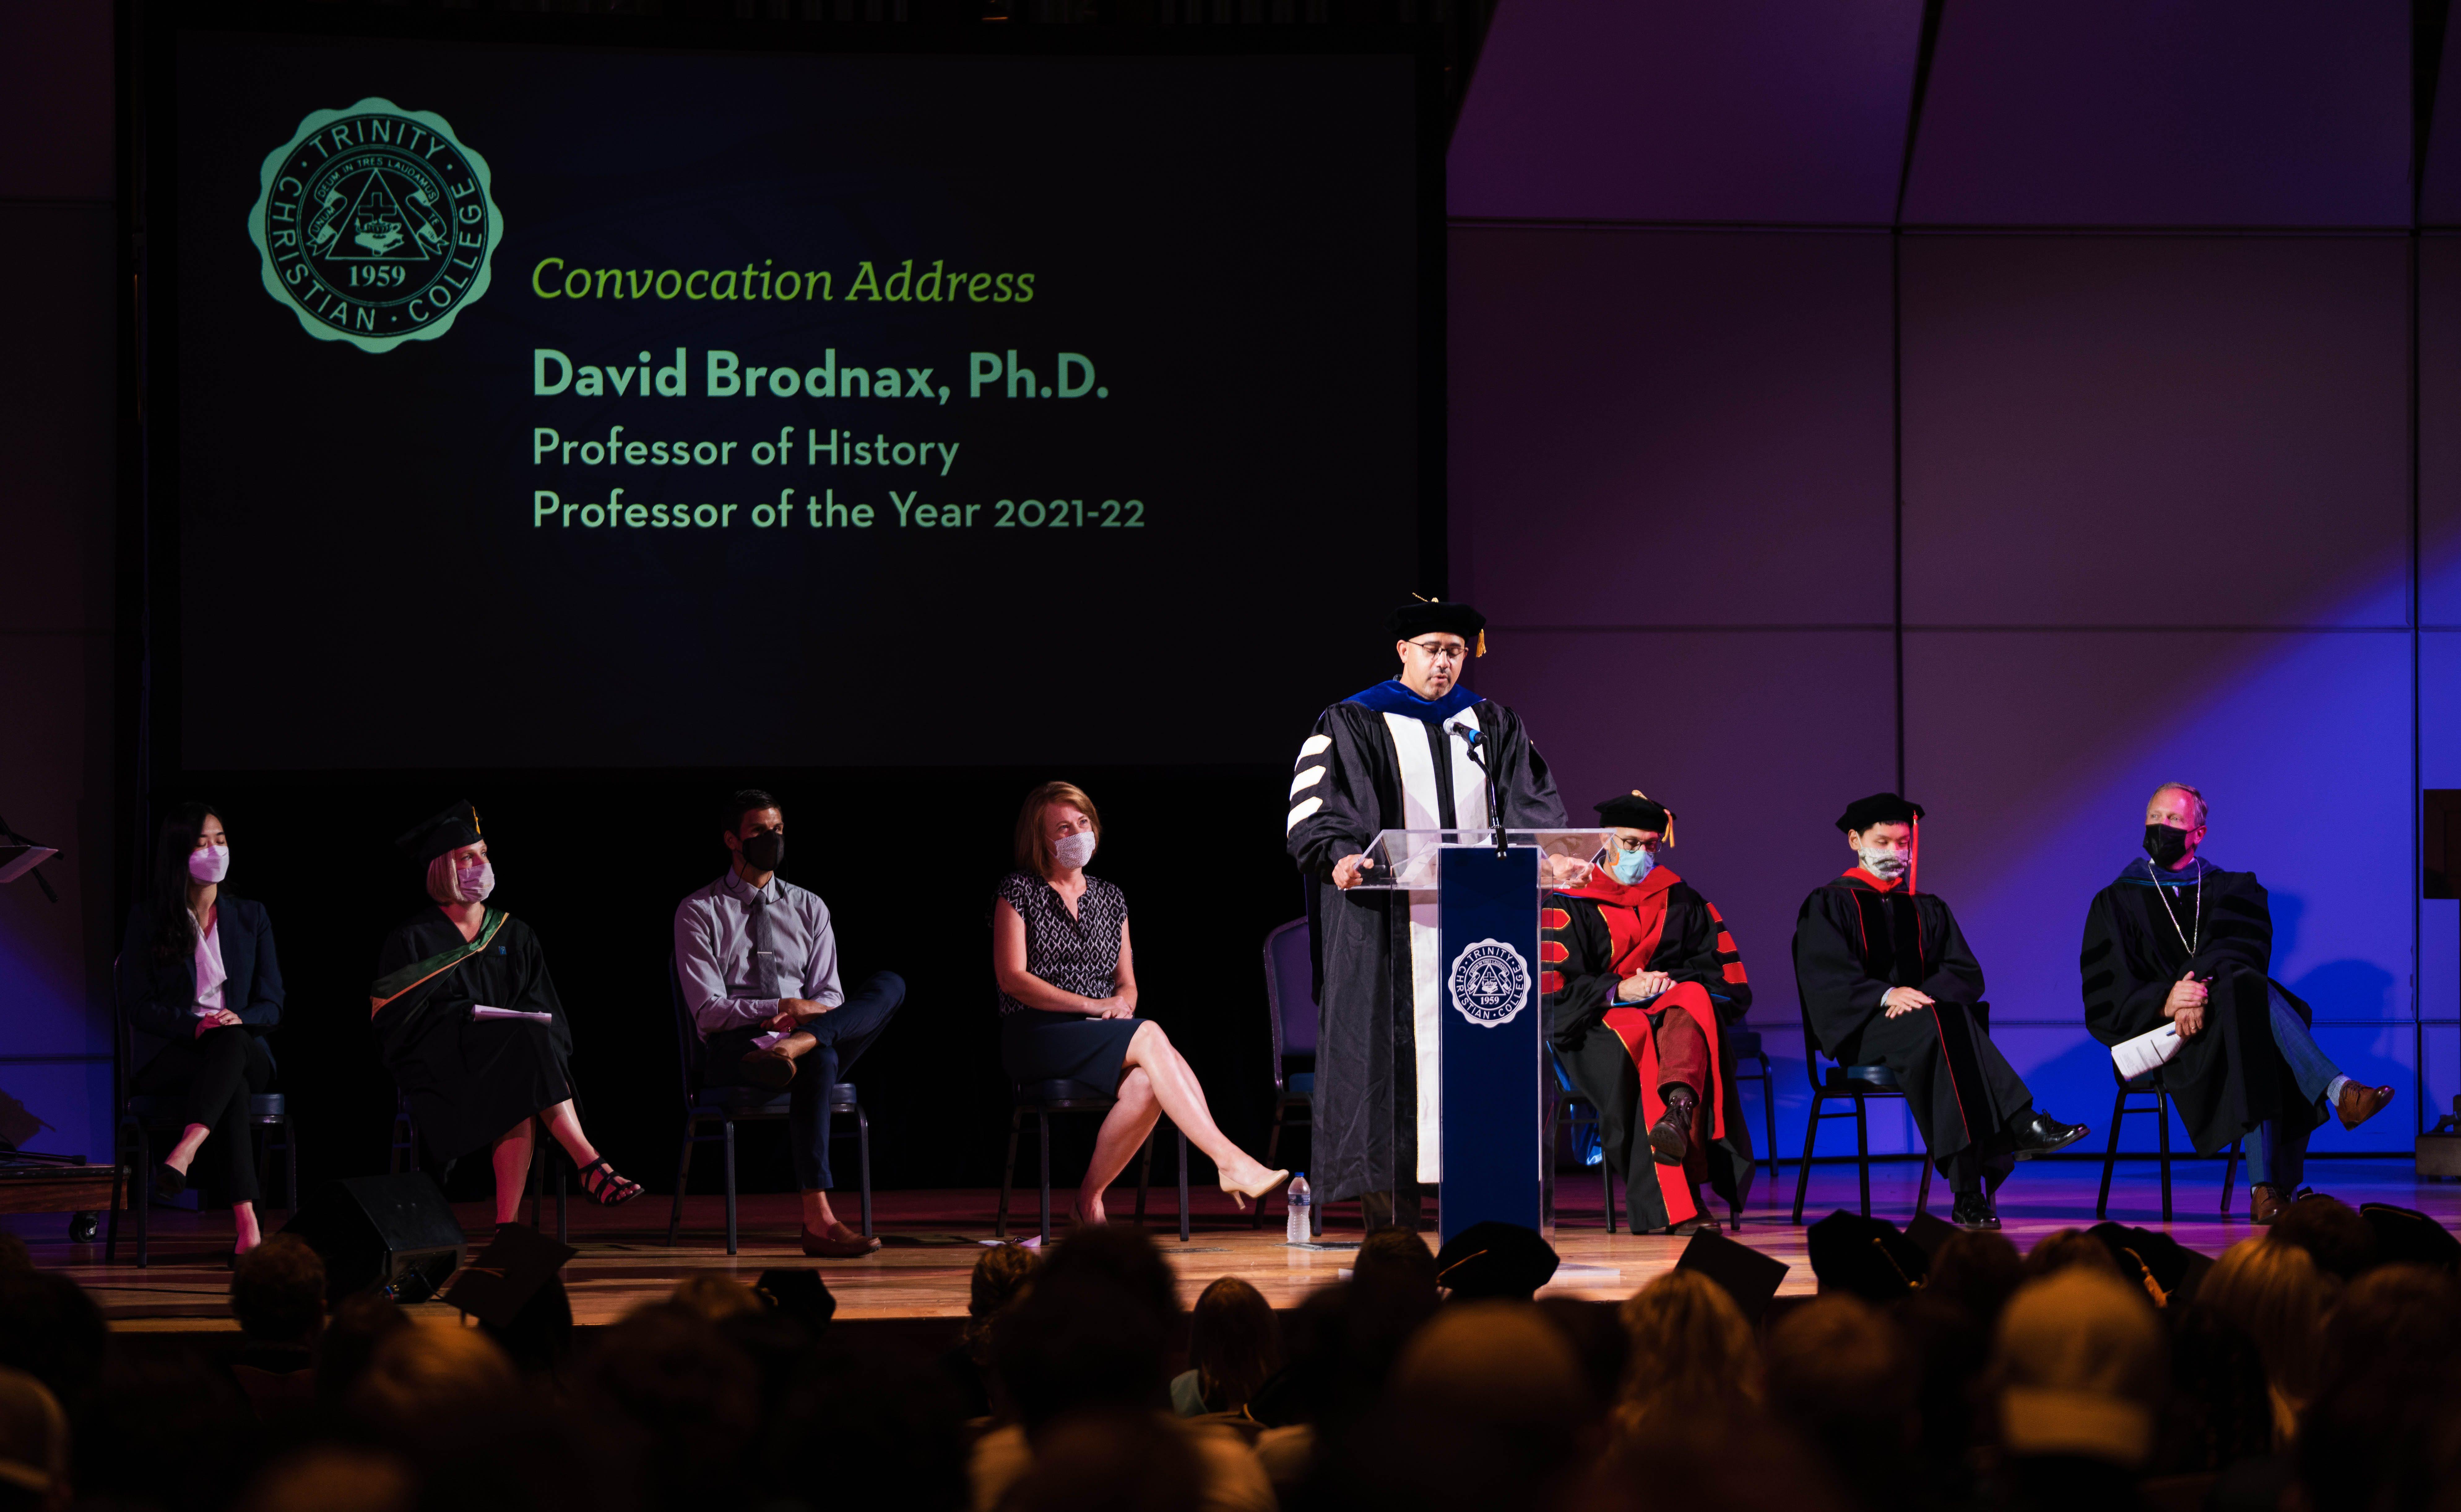 Professor of the year David Brodnax